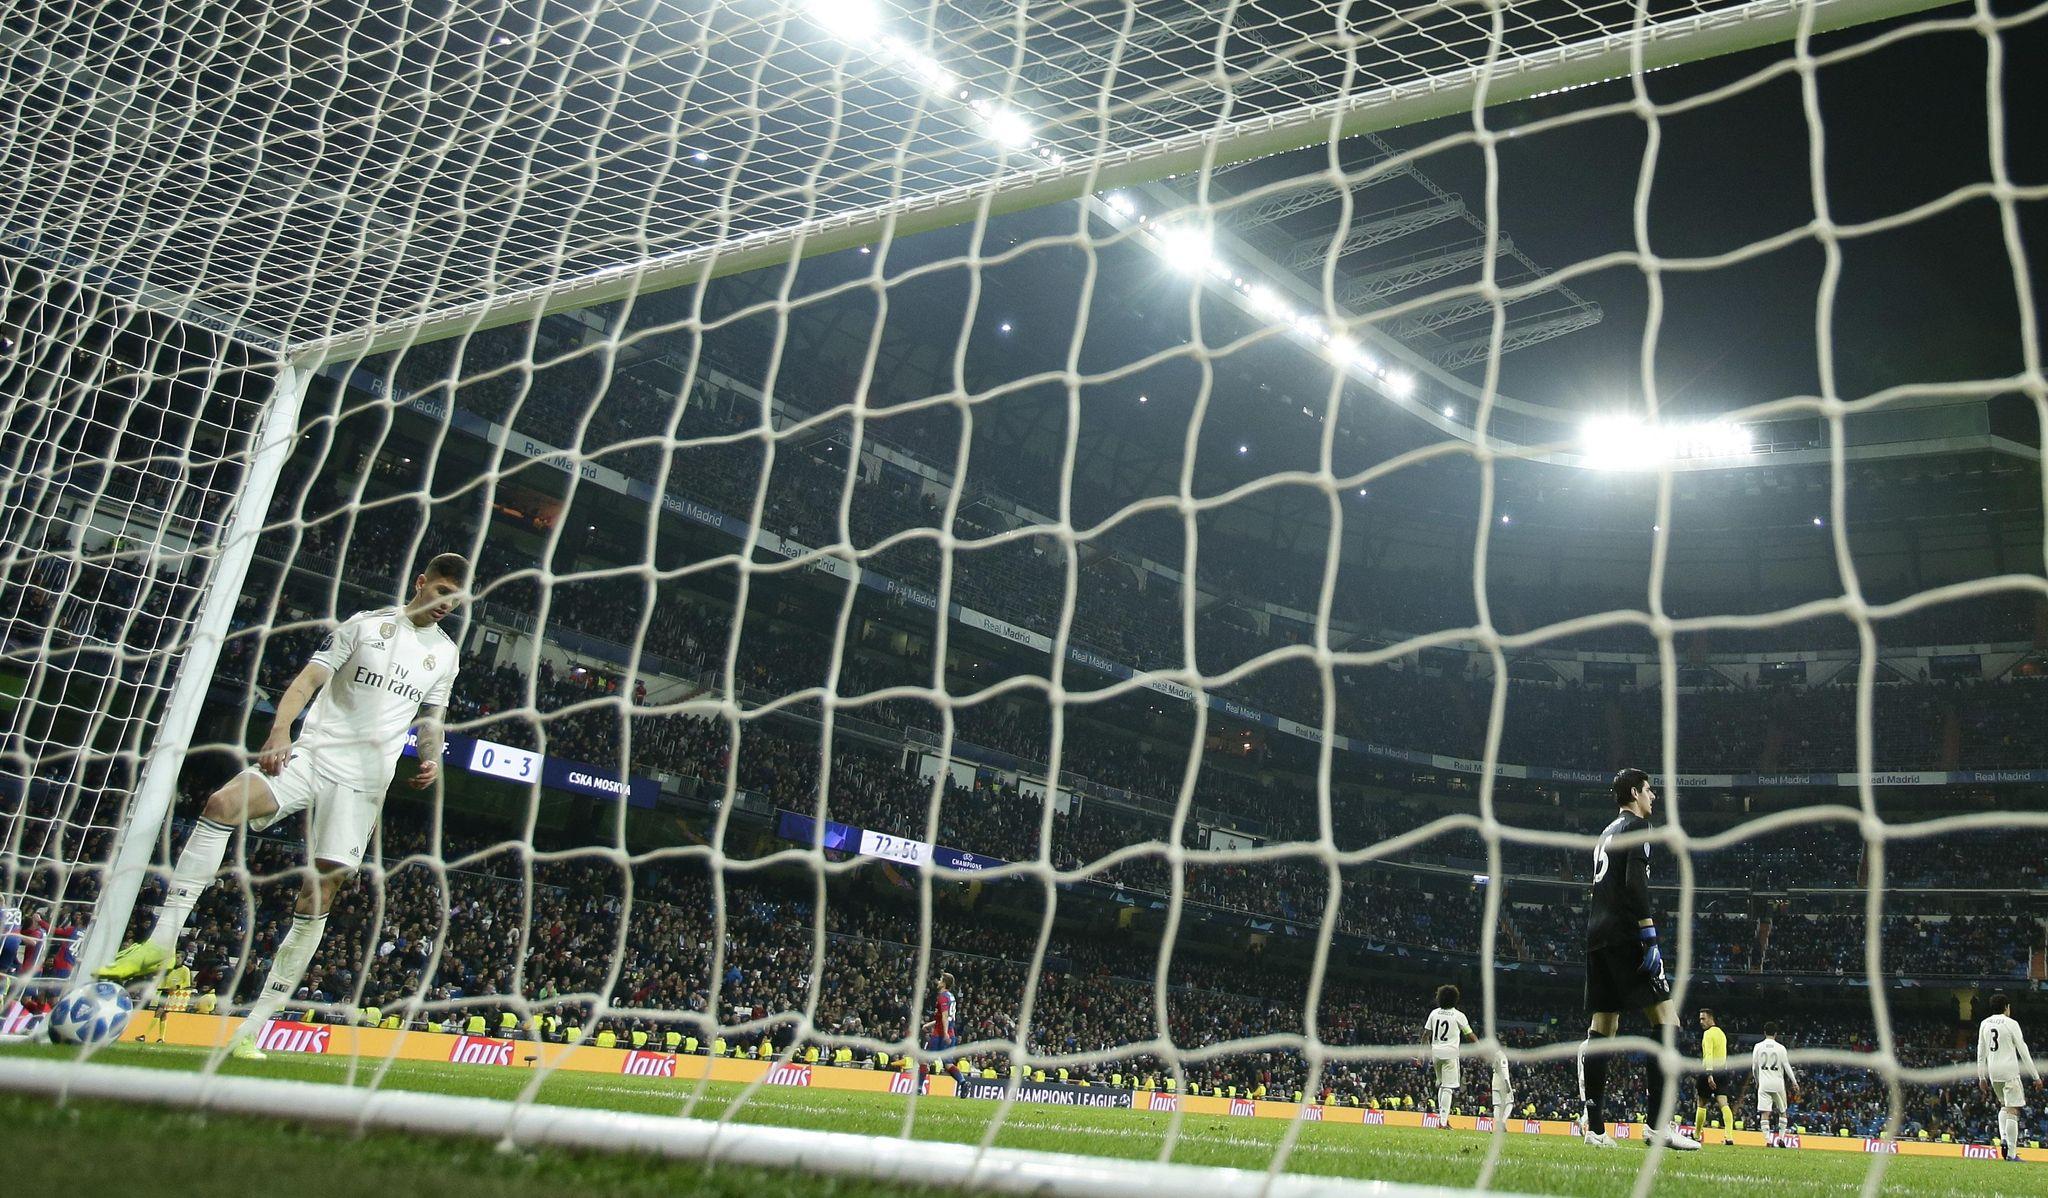 Spain_soccer_champions_league_21843_s2048x1198